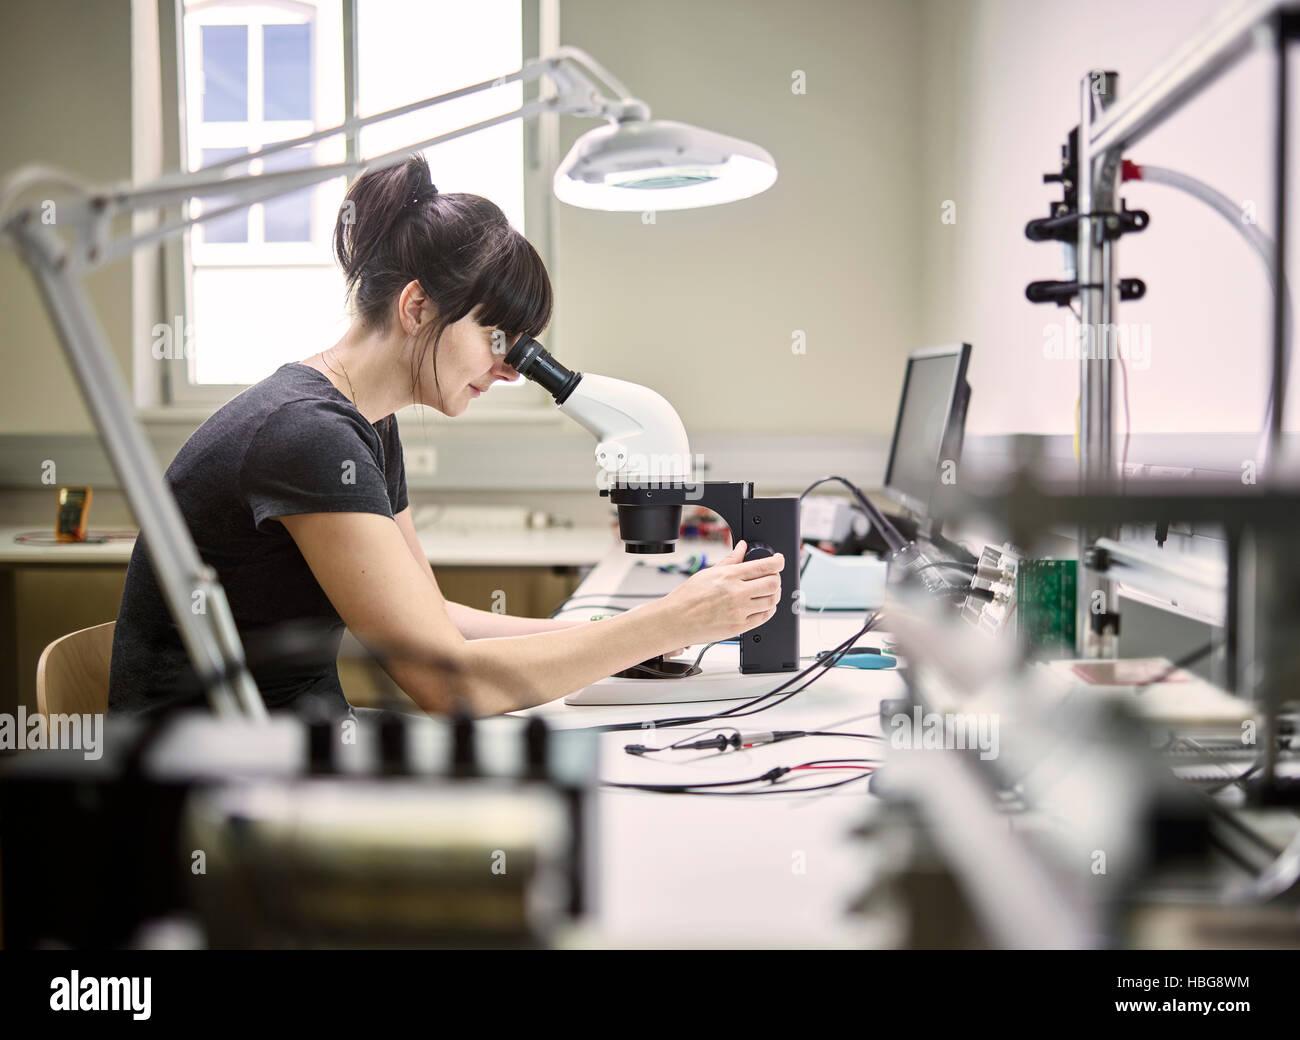 Technician, young woman using electronic microscope - Stock Image